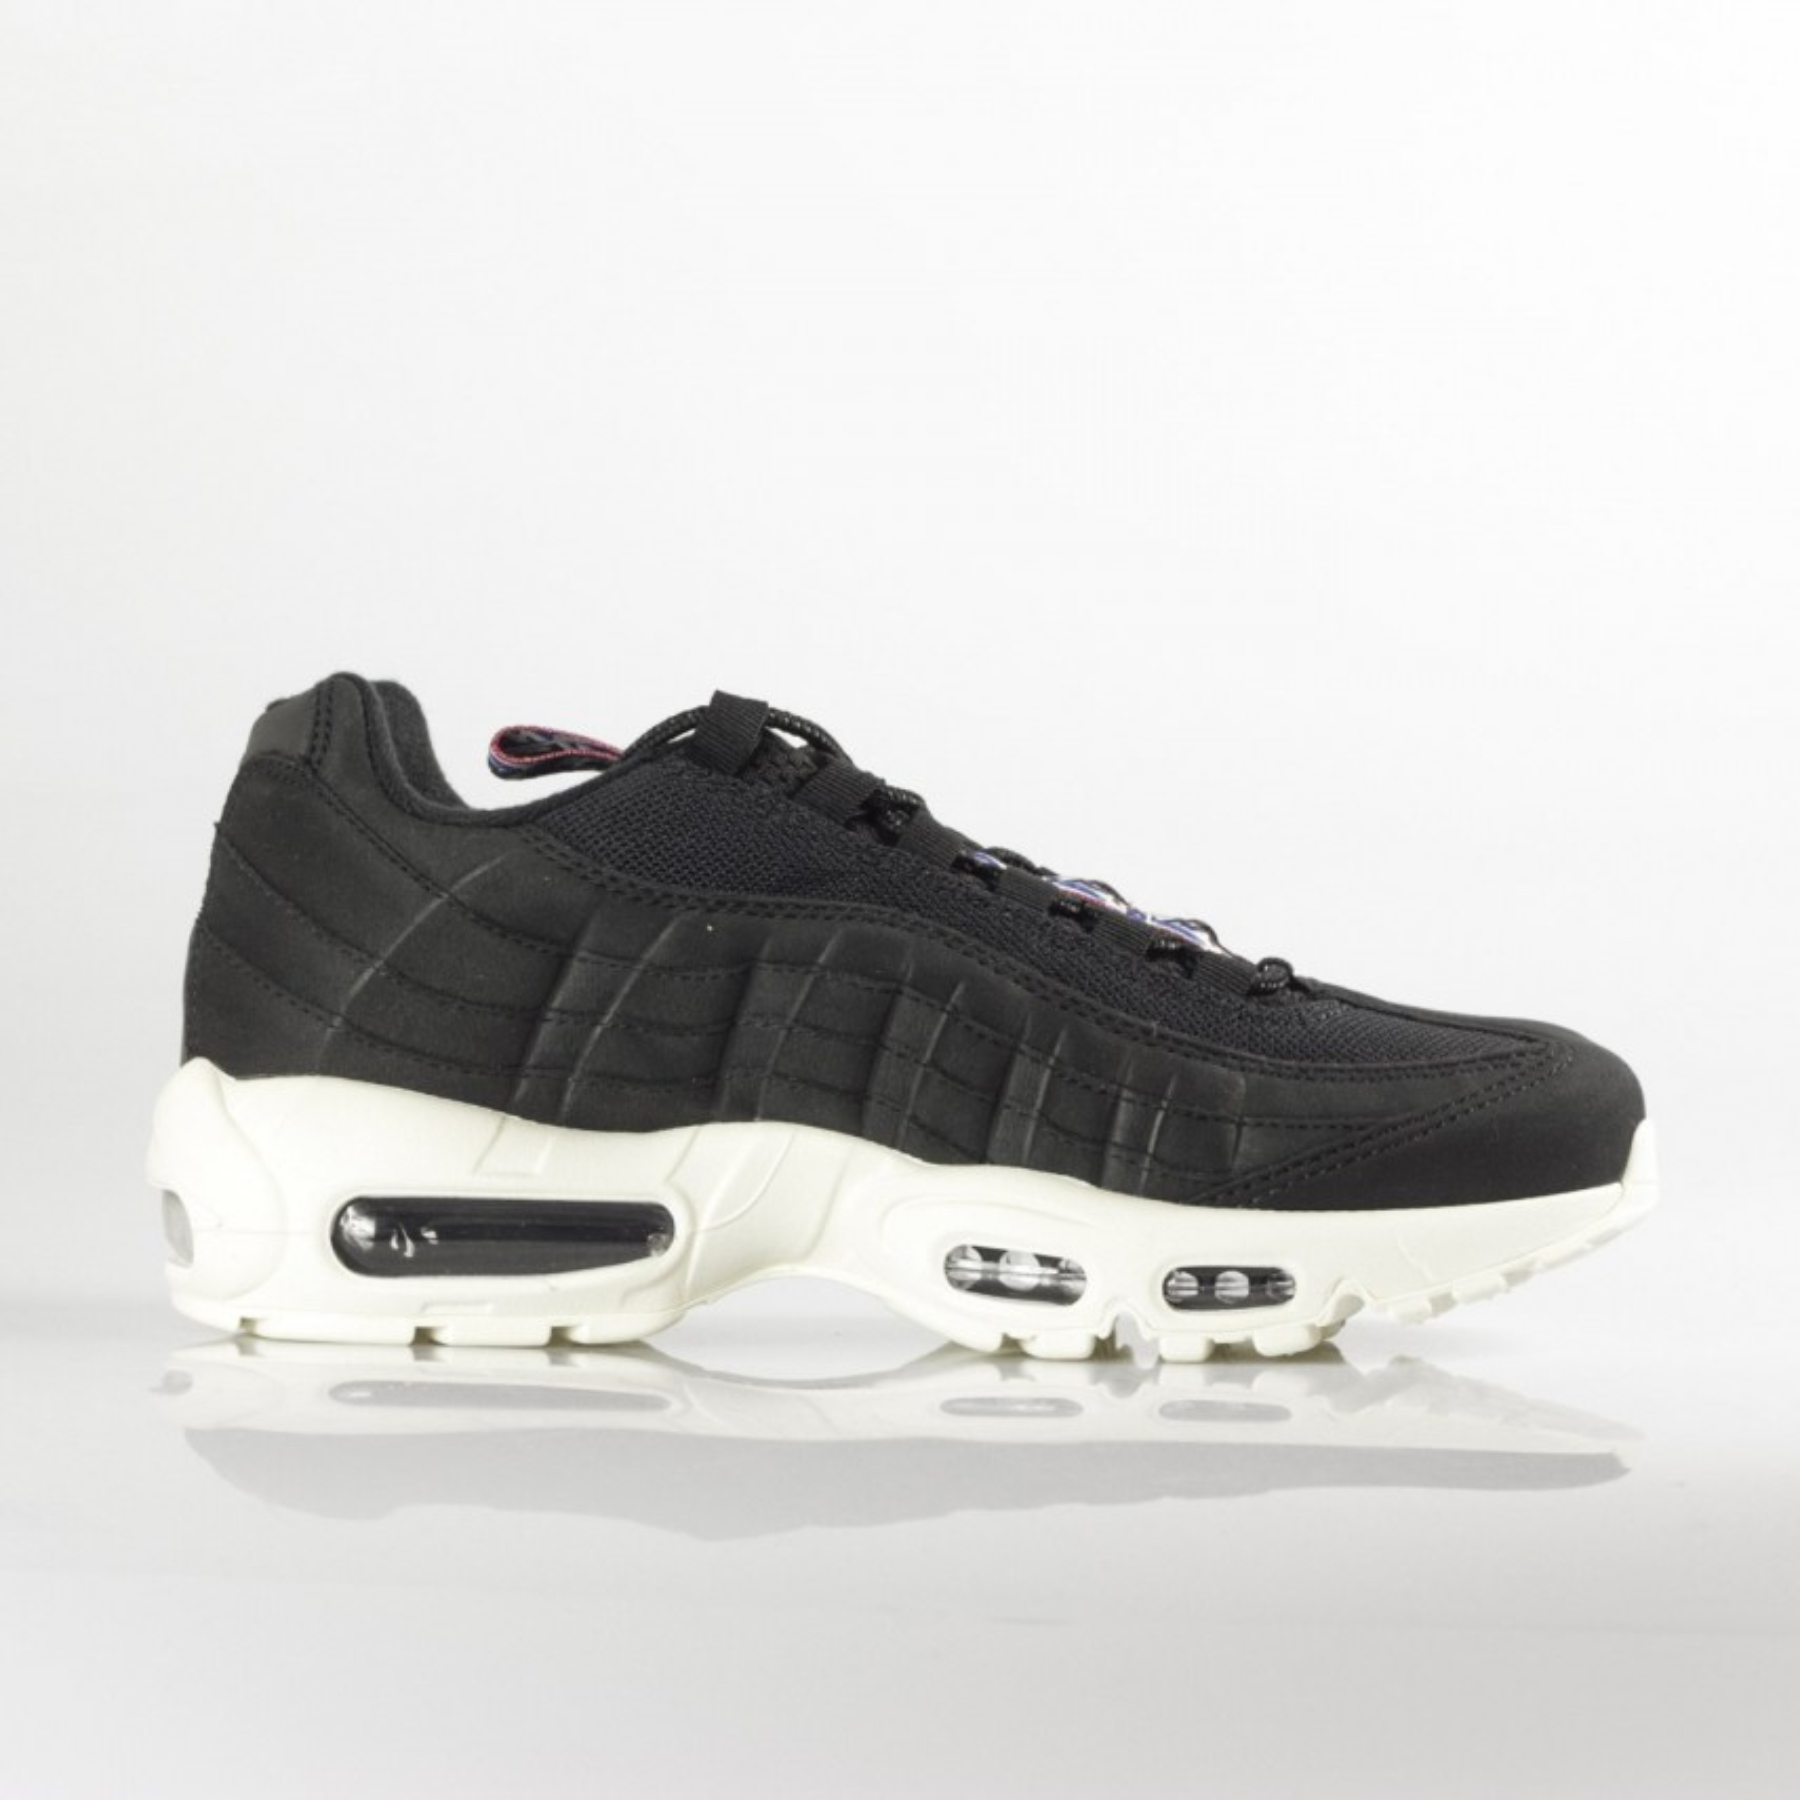 low sneaker man air max 95 tt BLACK/SAIL/GYM RED